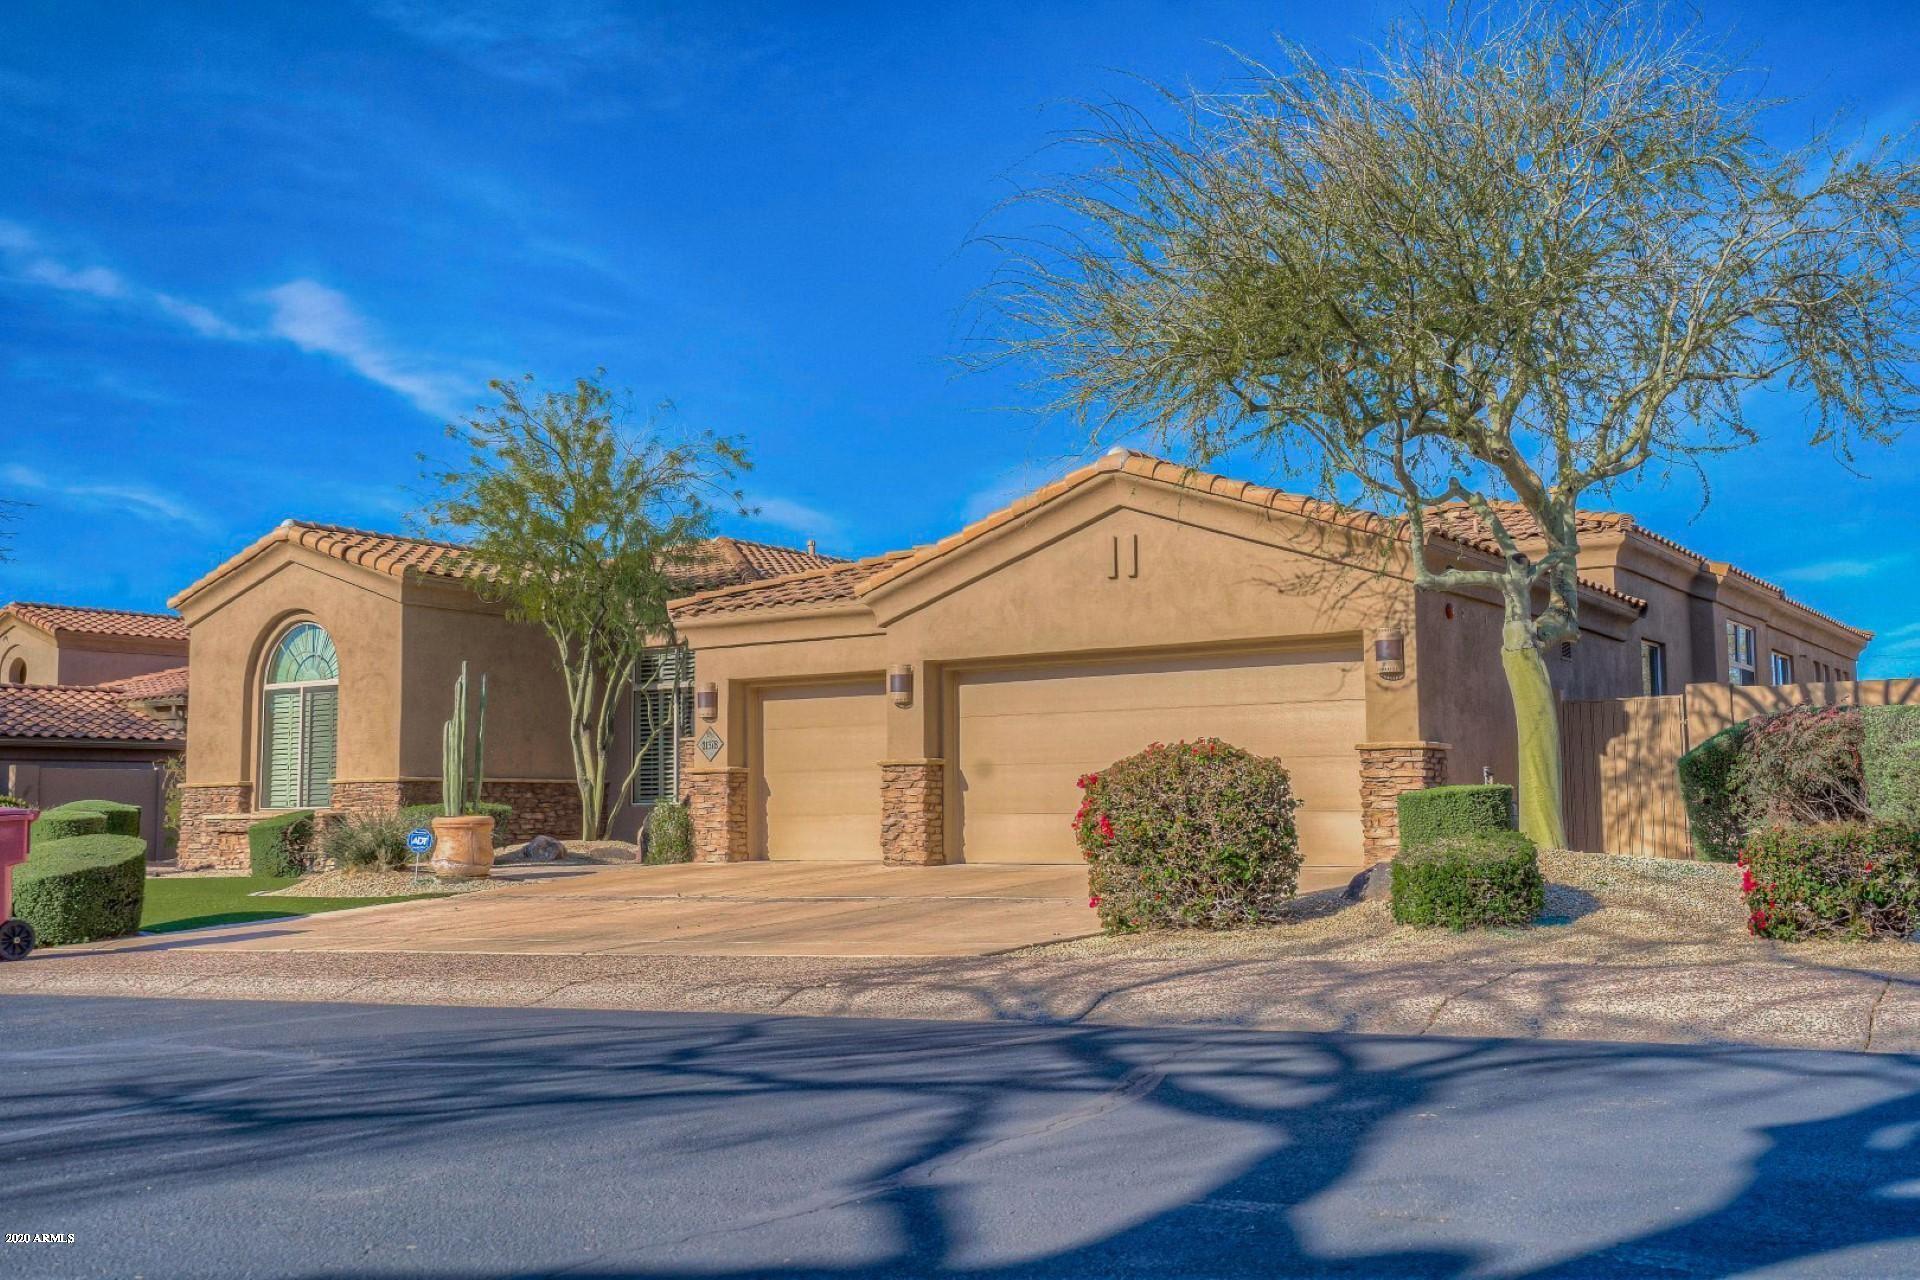 21378 N 78th Street, Scottsdale, AZ 85255 - #: 6045592